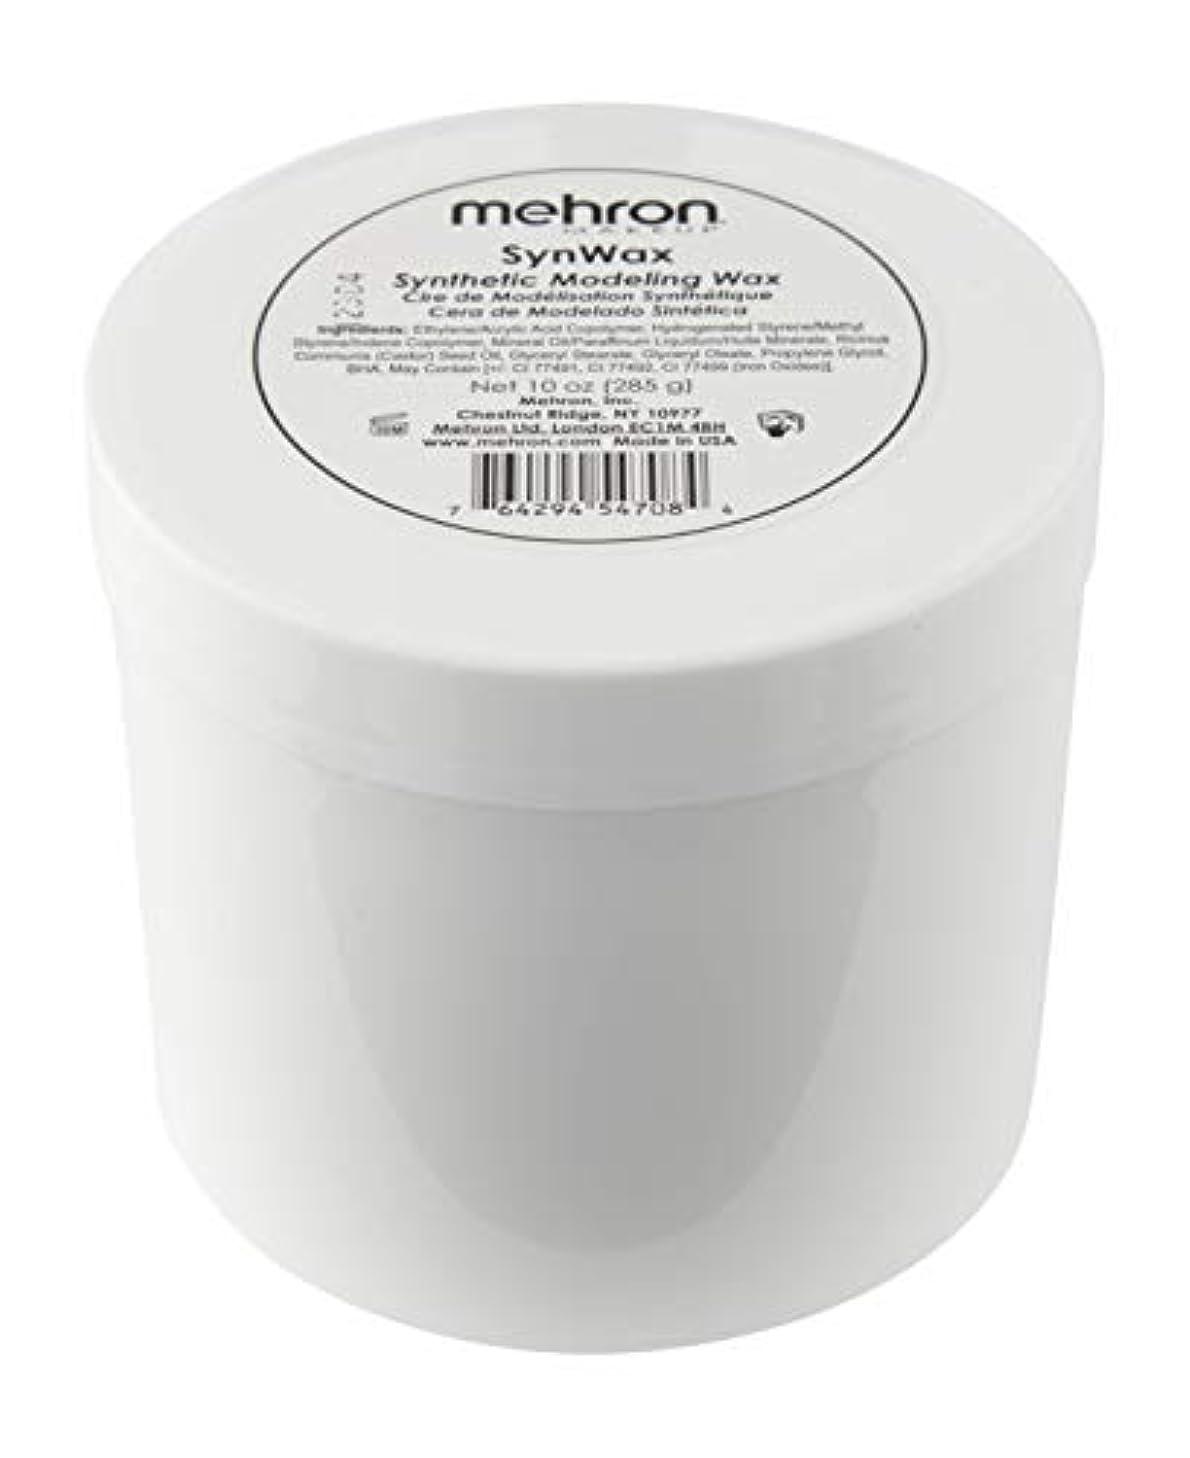 騒乱不倫暫定mehron Modeling SynWax Large 10 oz (並行輸入品)